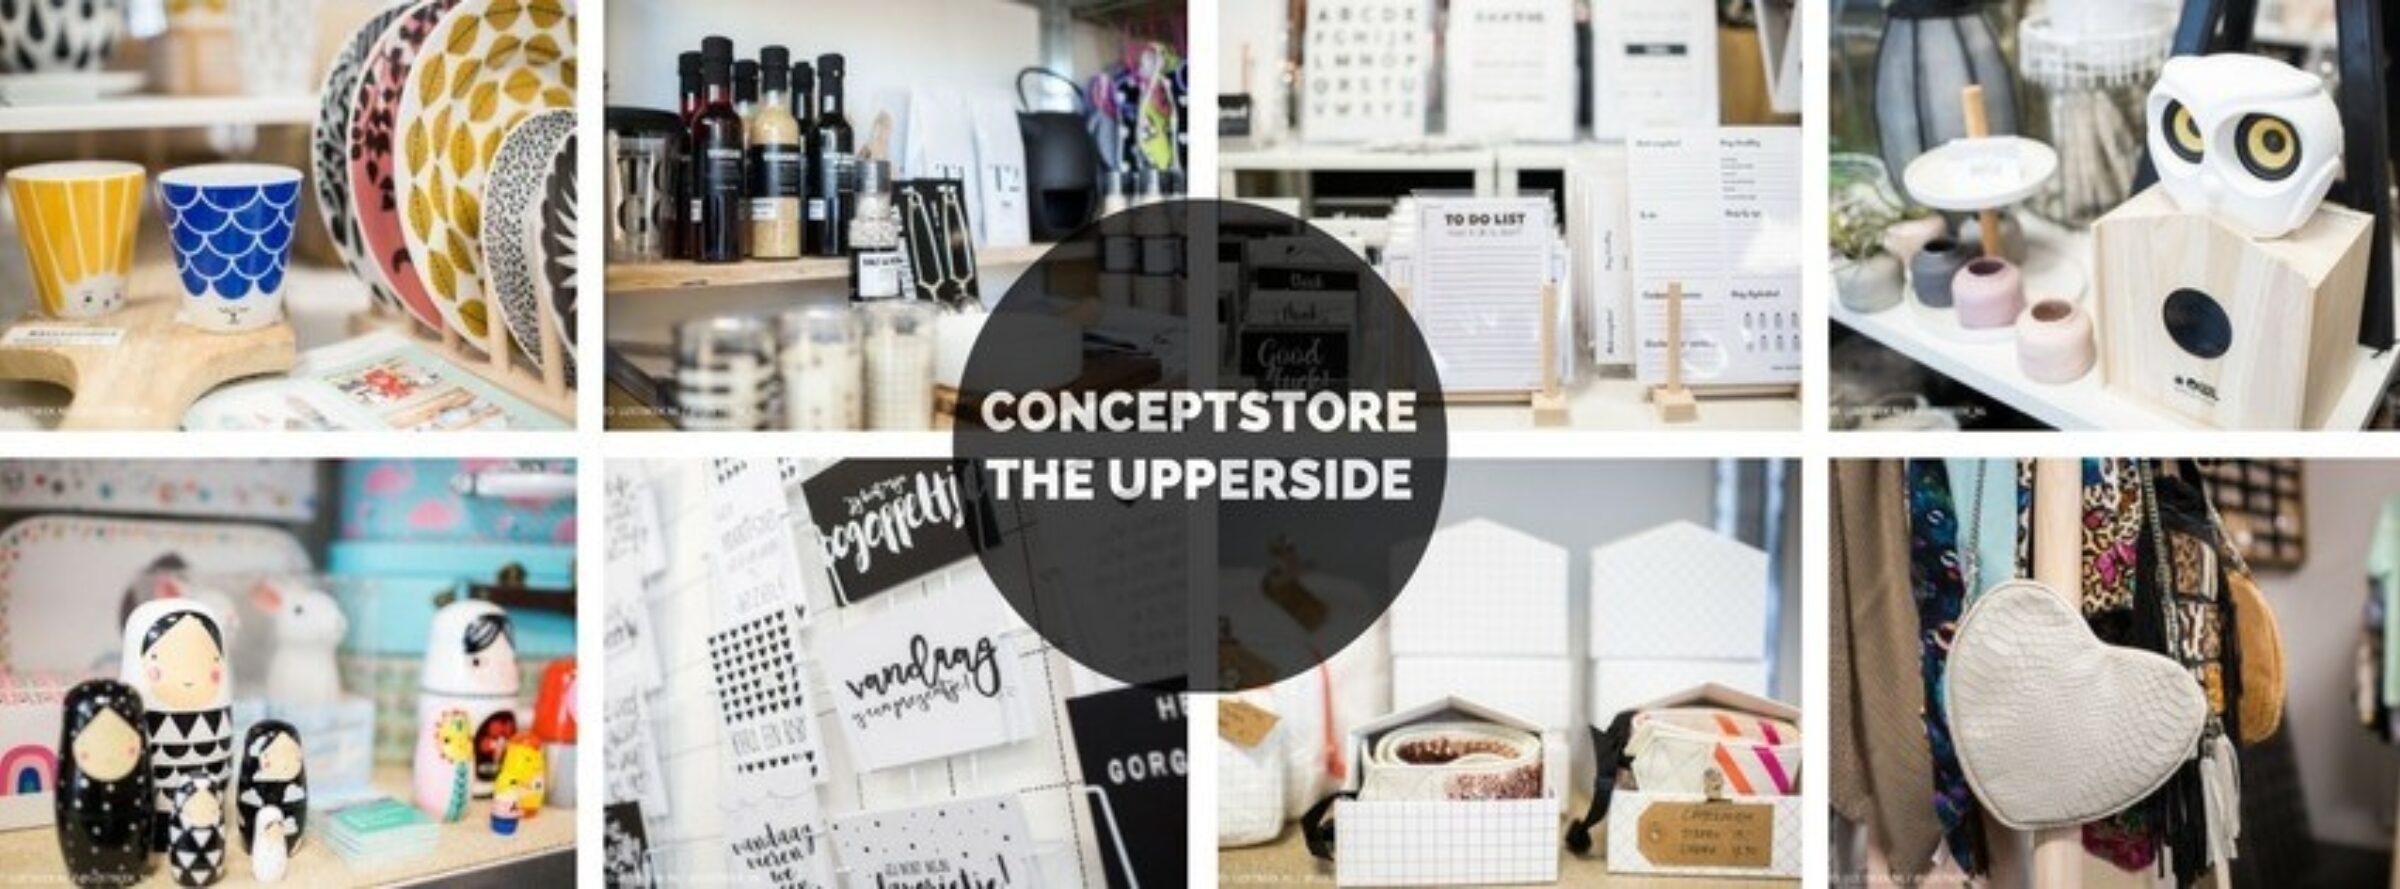 conceptstore the upperside enschede